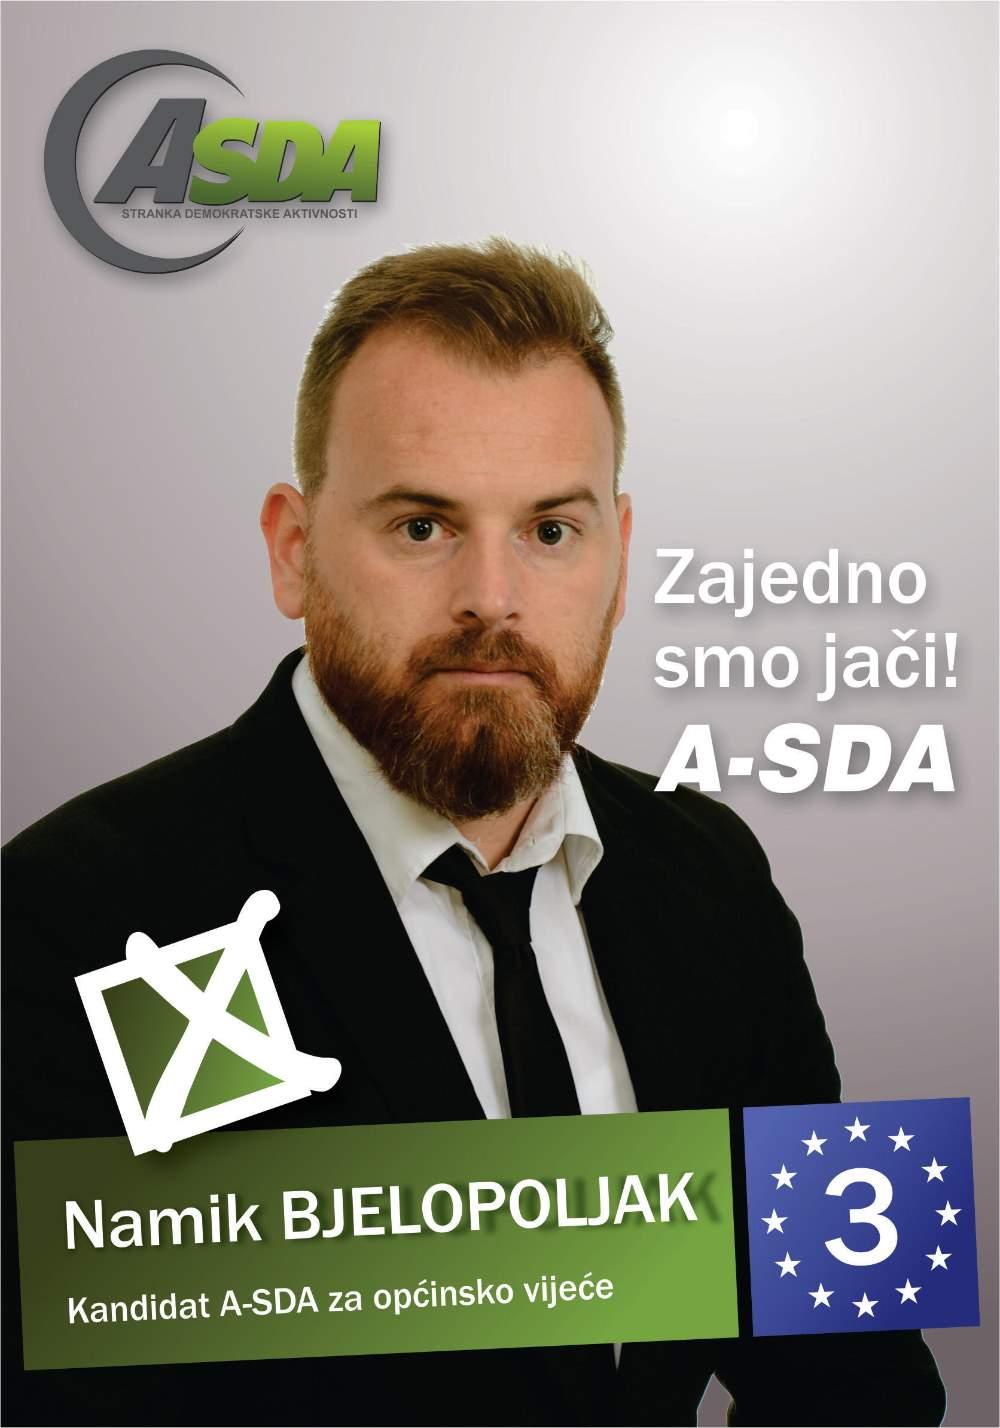 Namik Bjelopoljak